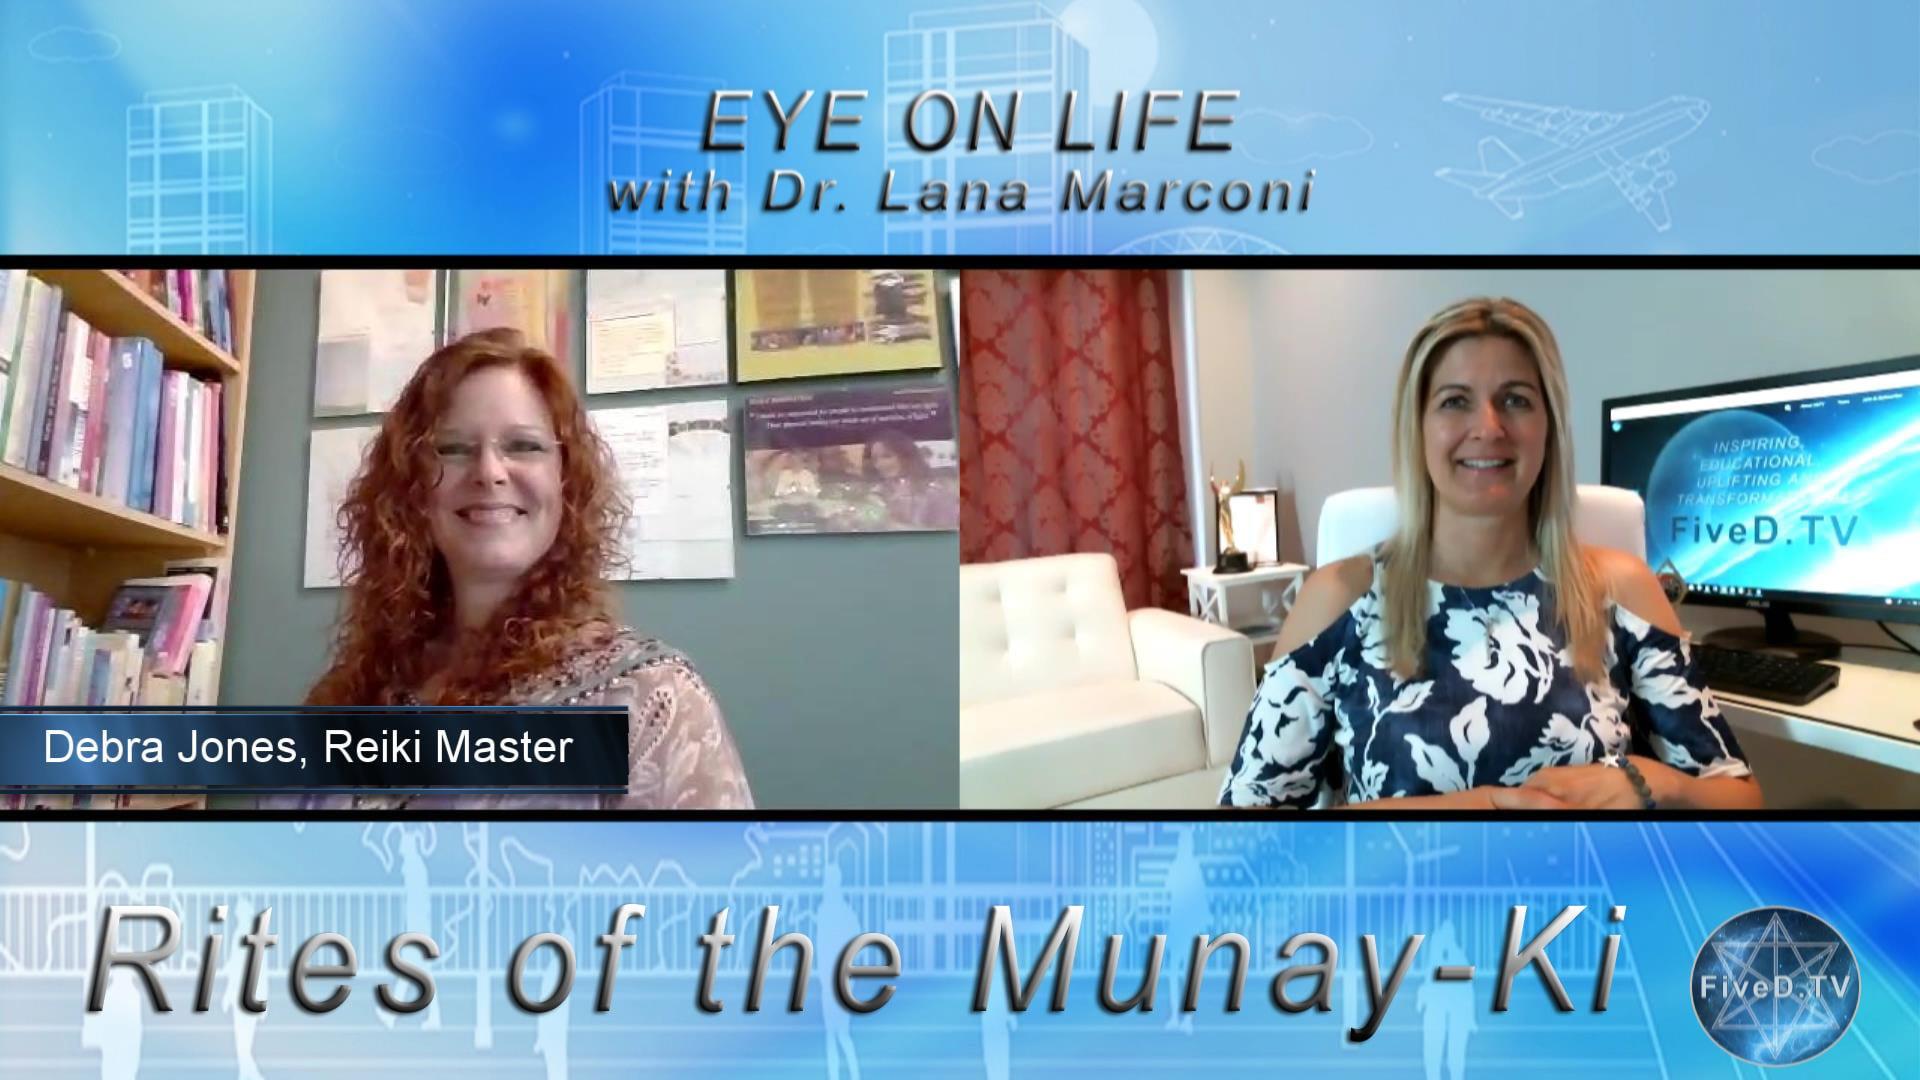 Eye On Life: The Rites of the Munay-Ki